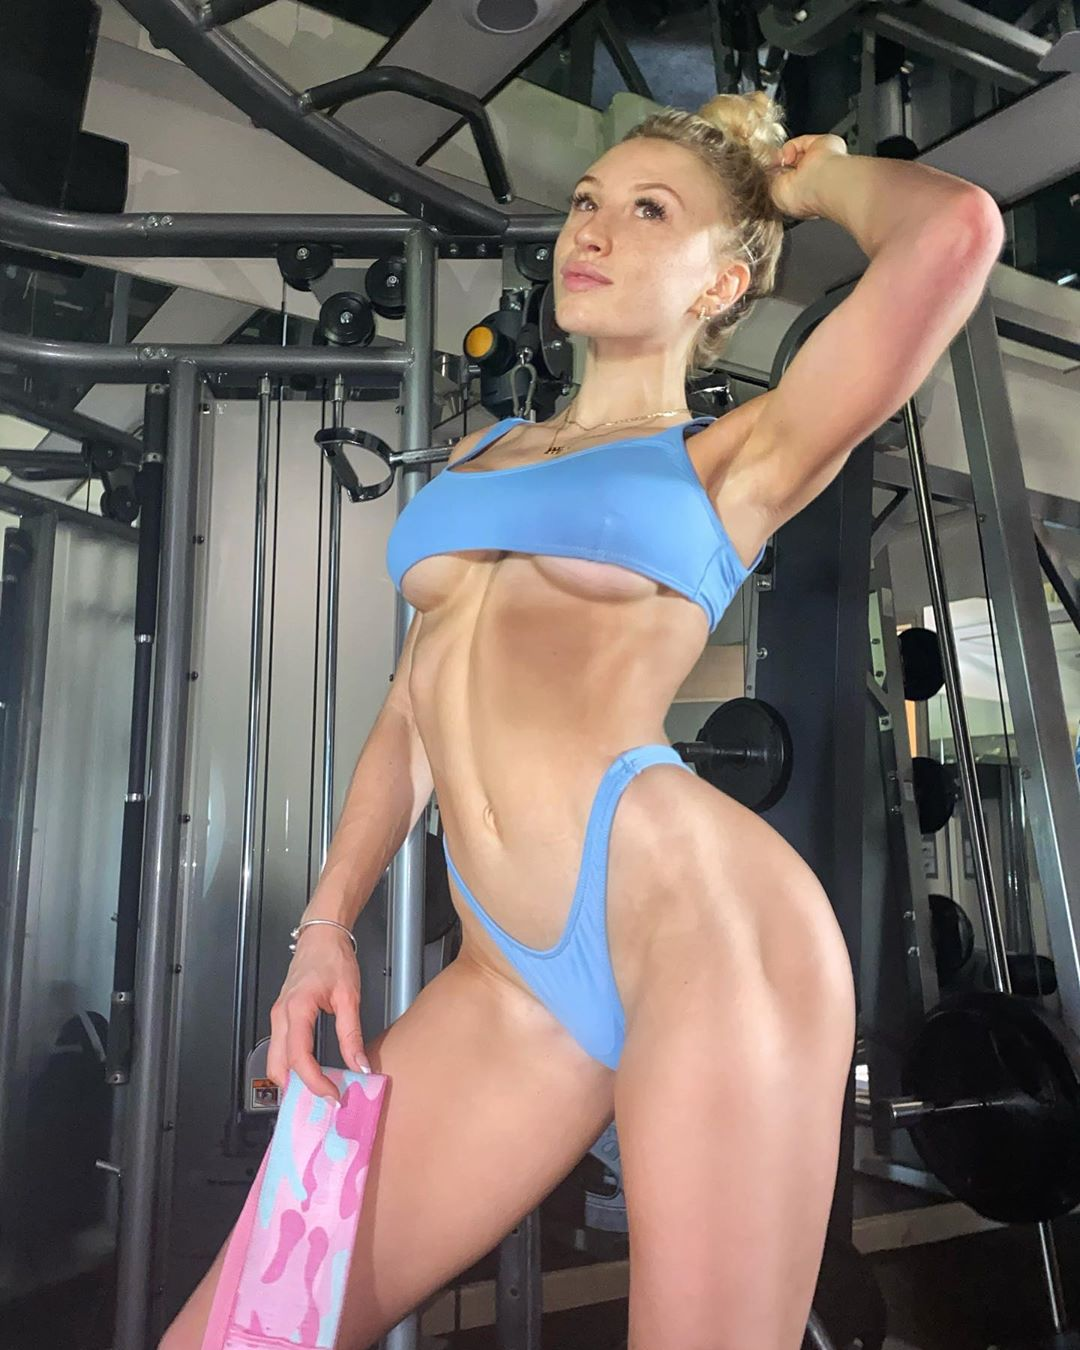 Lauren Dascalo Nude Onlyfans Leaked! 0040